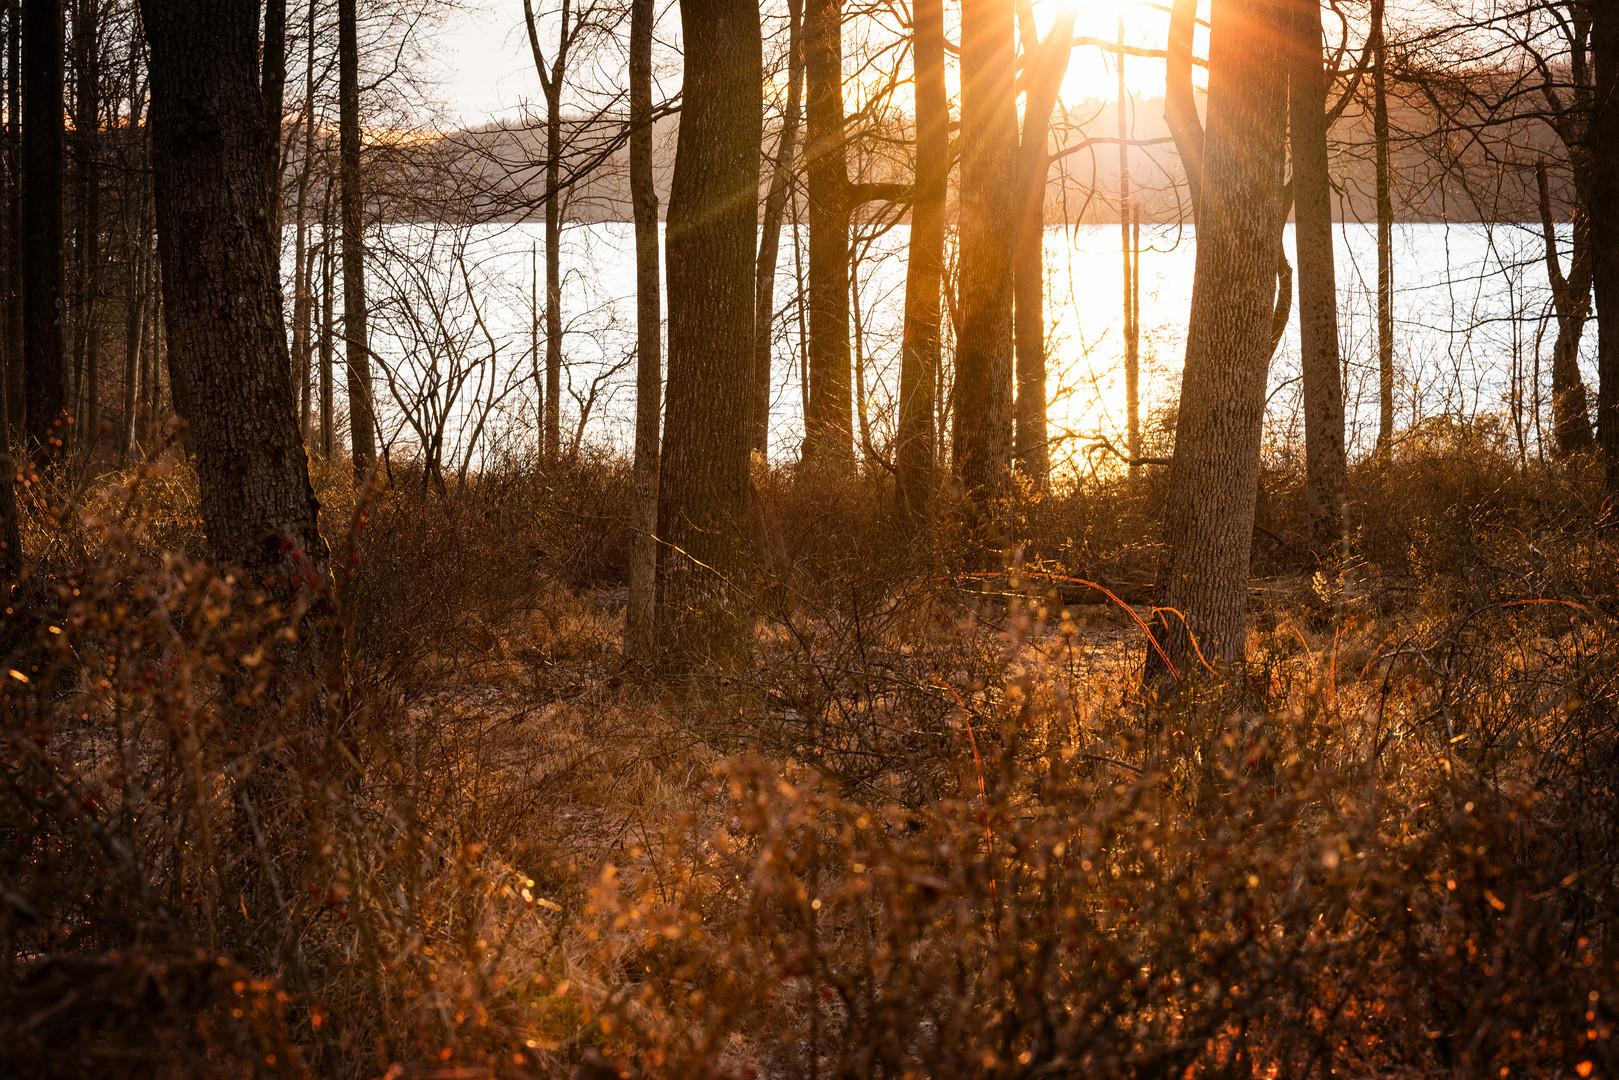 Late Afternoon Sun, Merrill Creek Reservoir, New Jersey